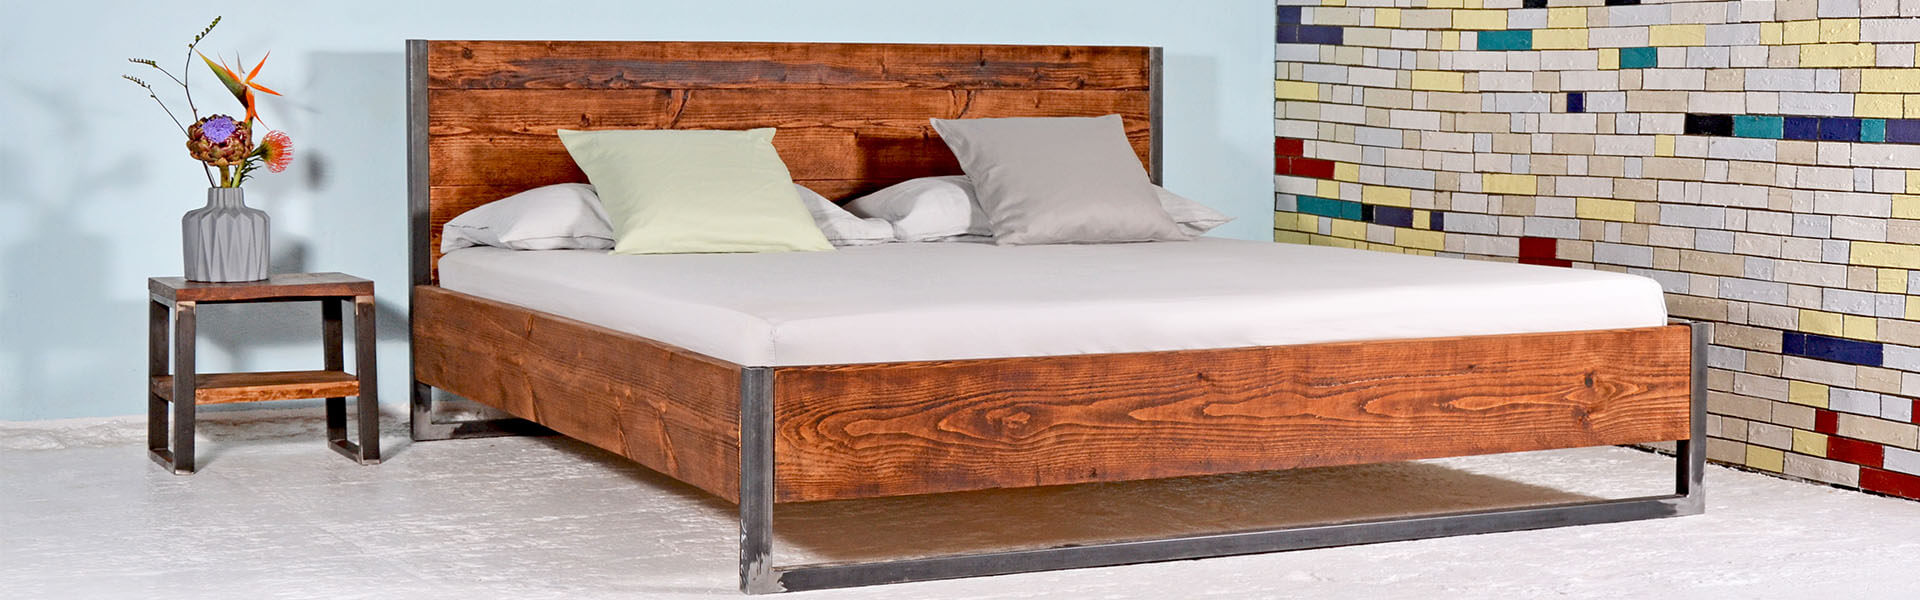 bett industrial design. Black Bedroom Furniture Sets. Home Design Ideas